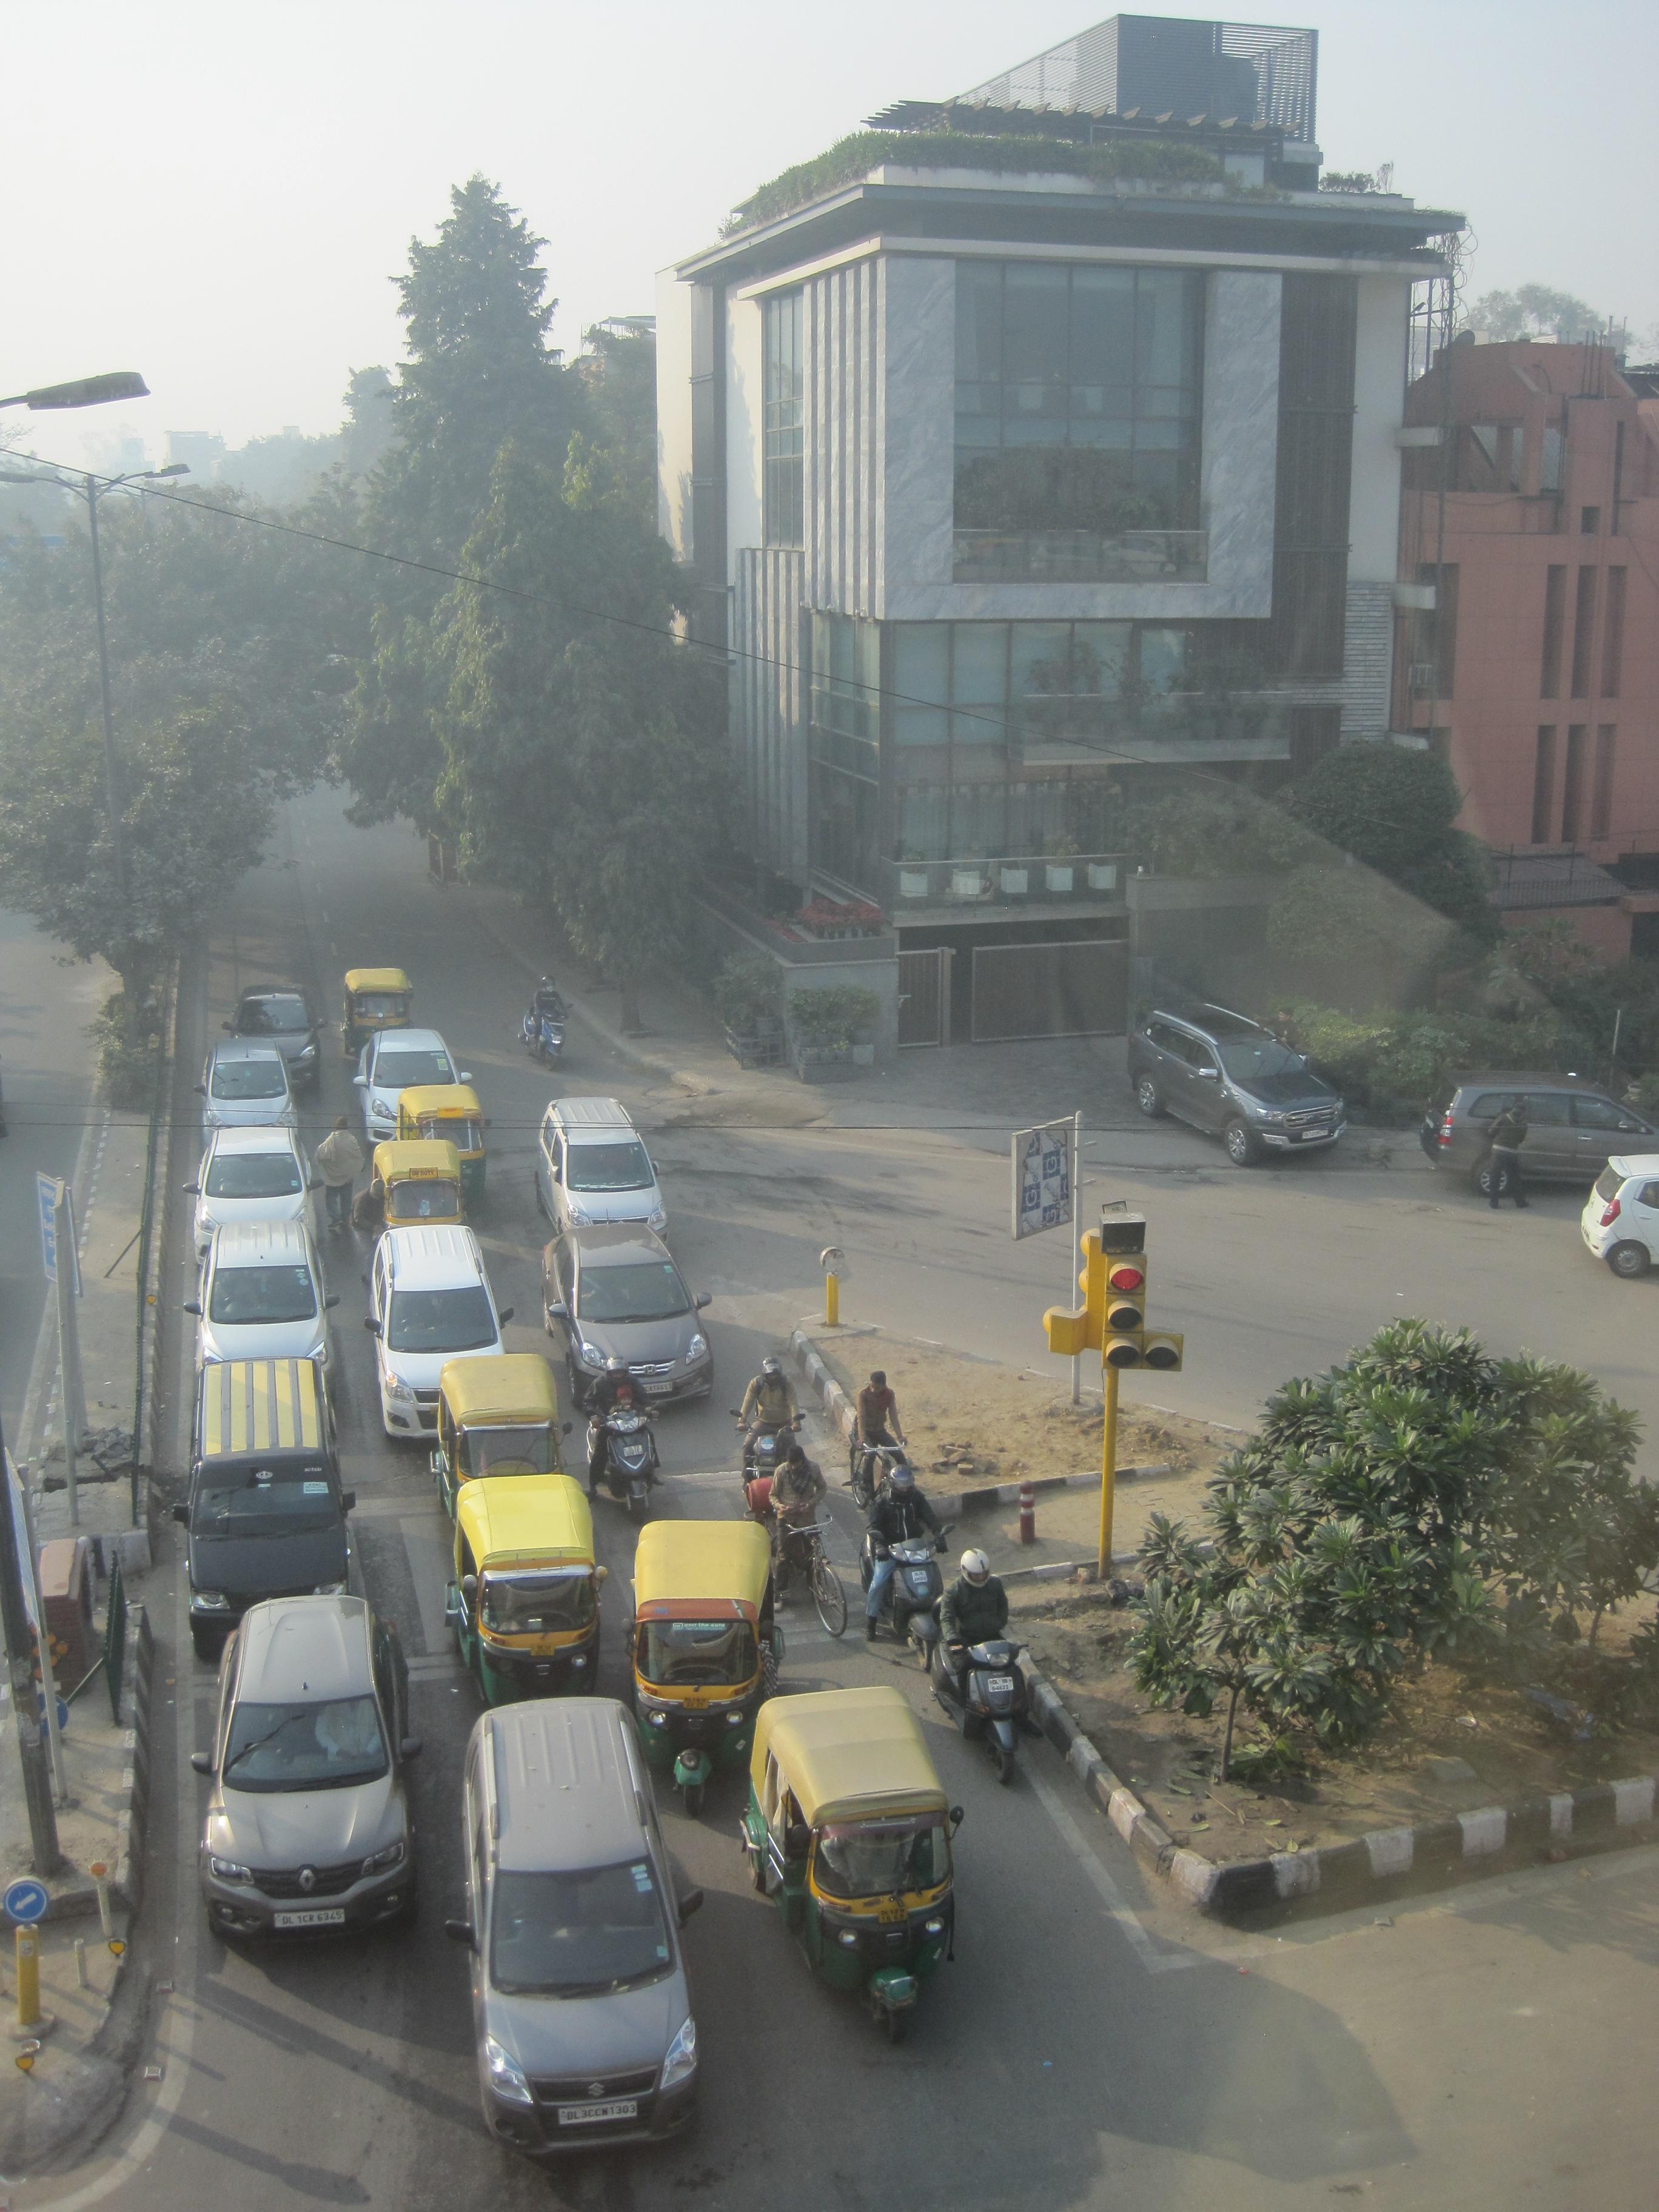 Driving through Delhi - photo by Juliamaud